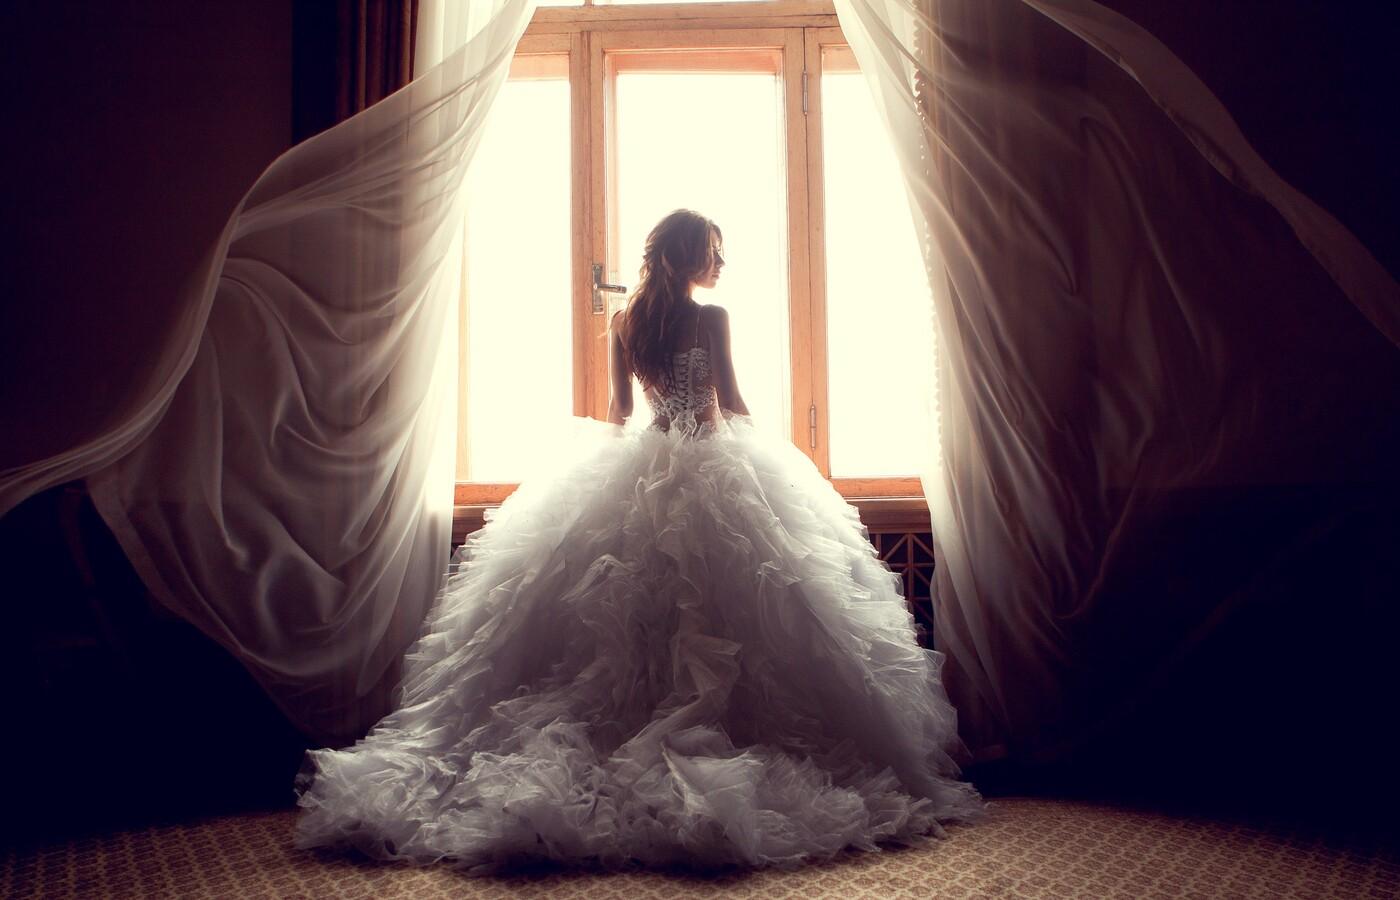 wedding-dress-bride-img.jpg